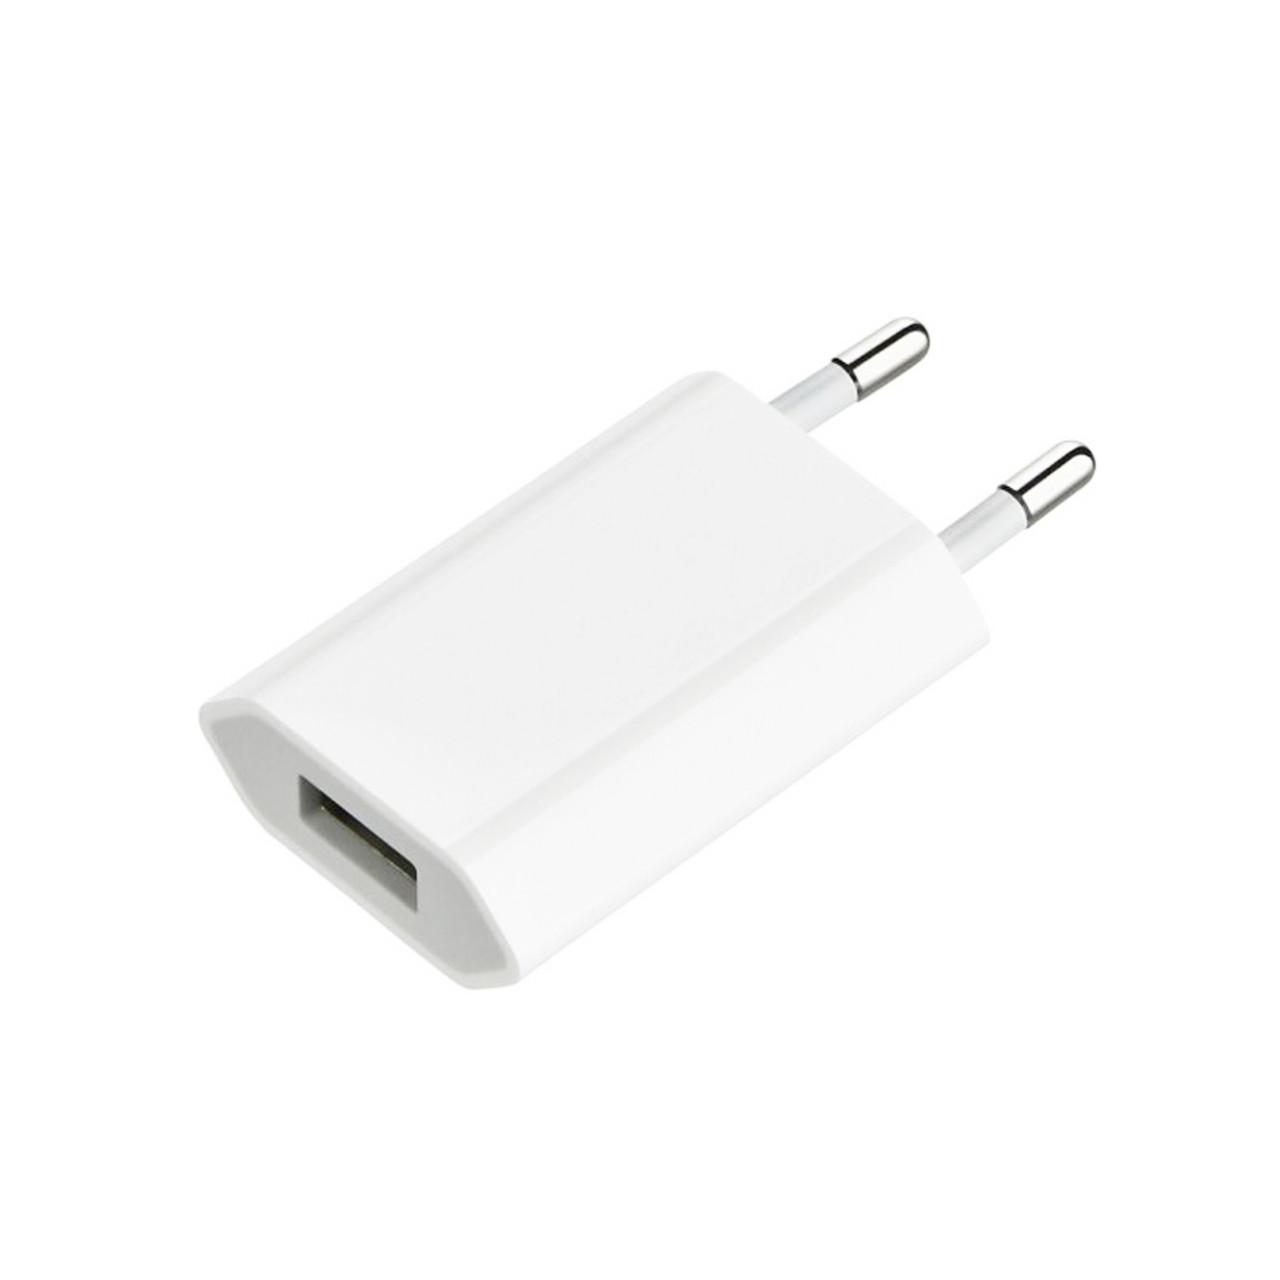 СЗУ Apple USB Power Adapter iPhone Slim/1A Original